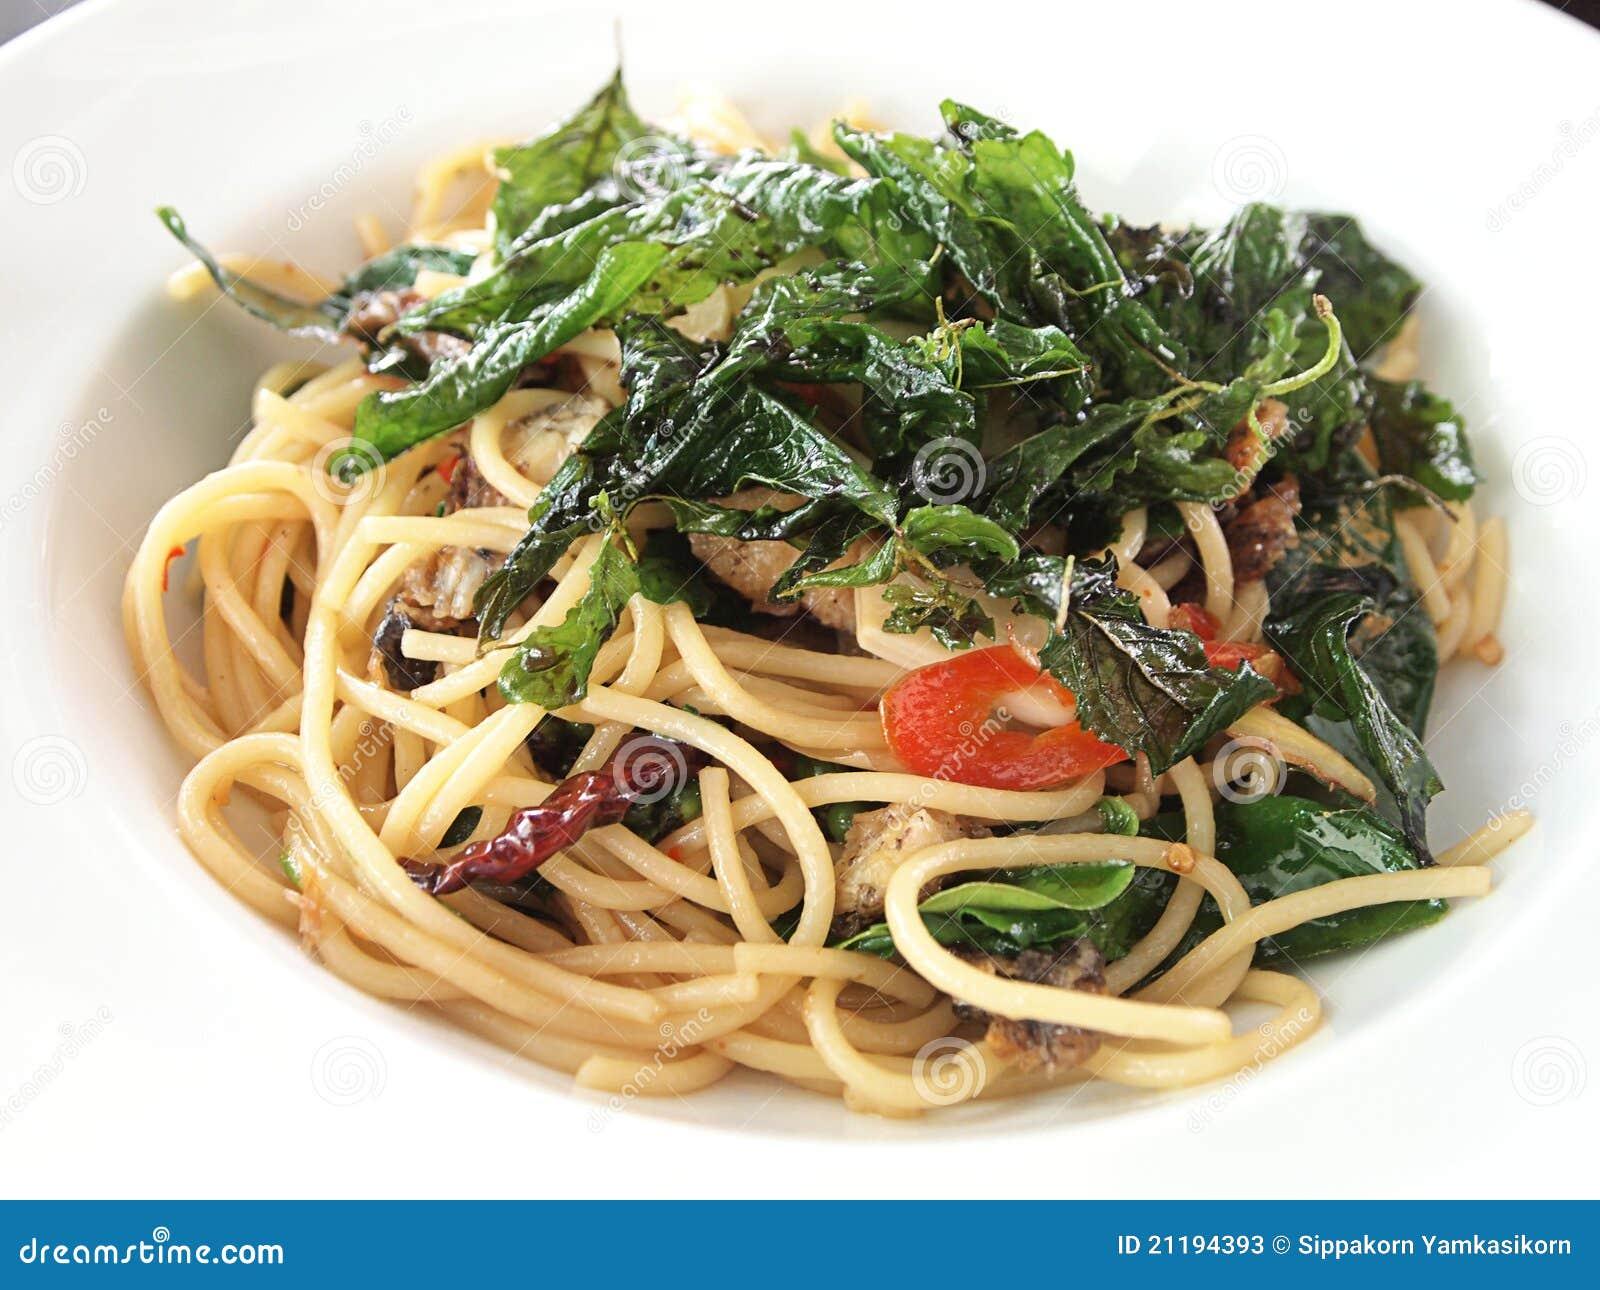 Crispy Salted Fish Spaghetti